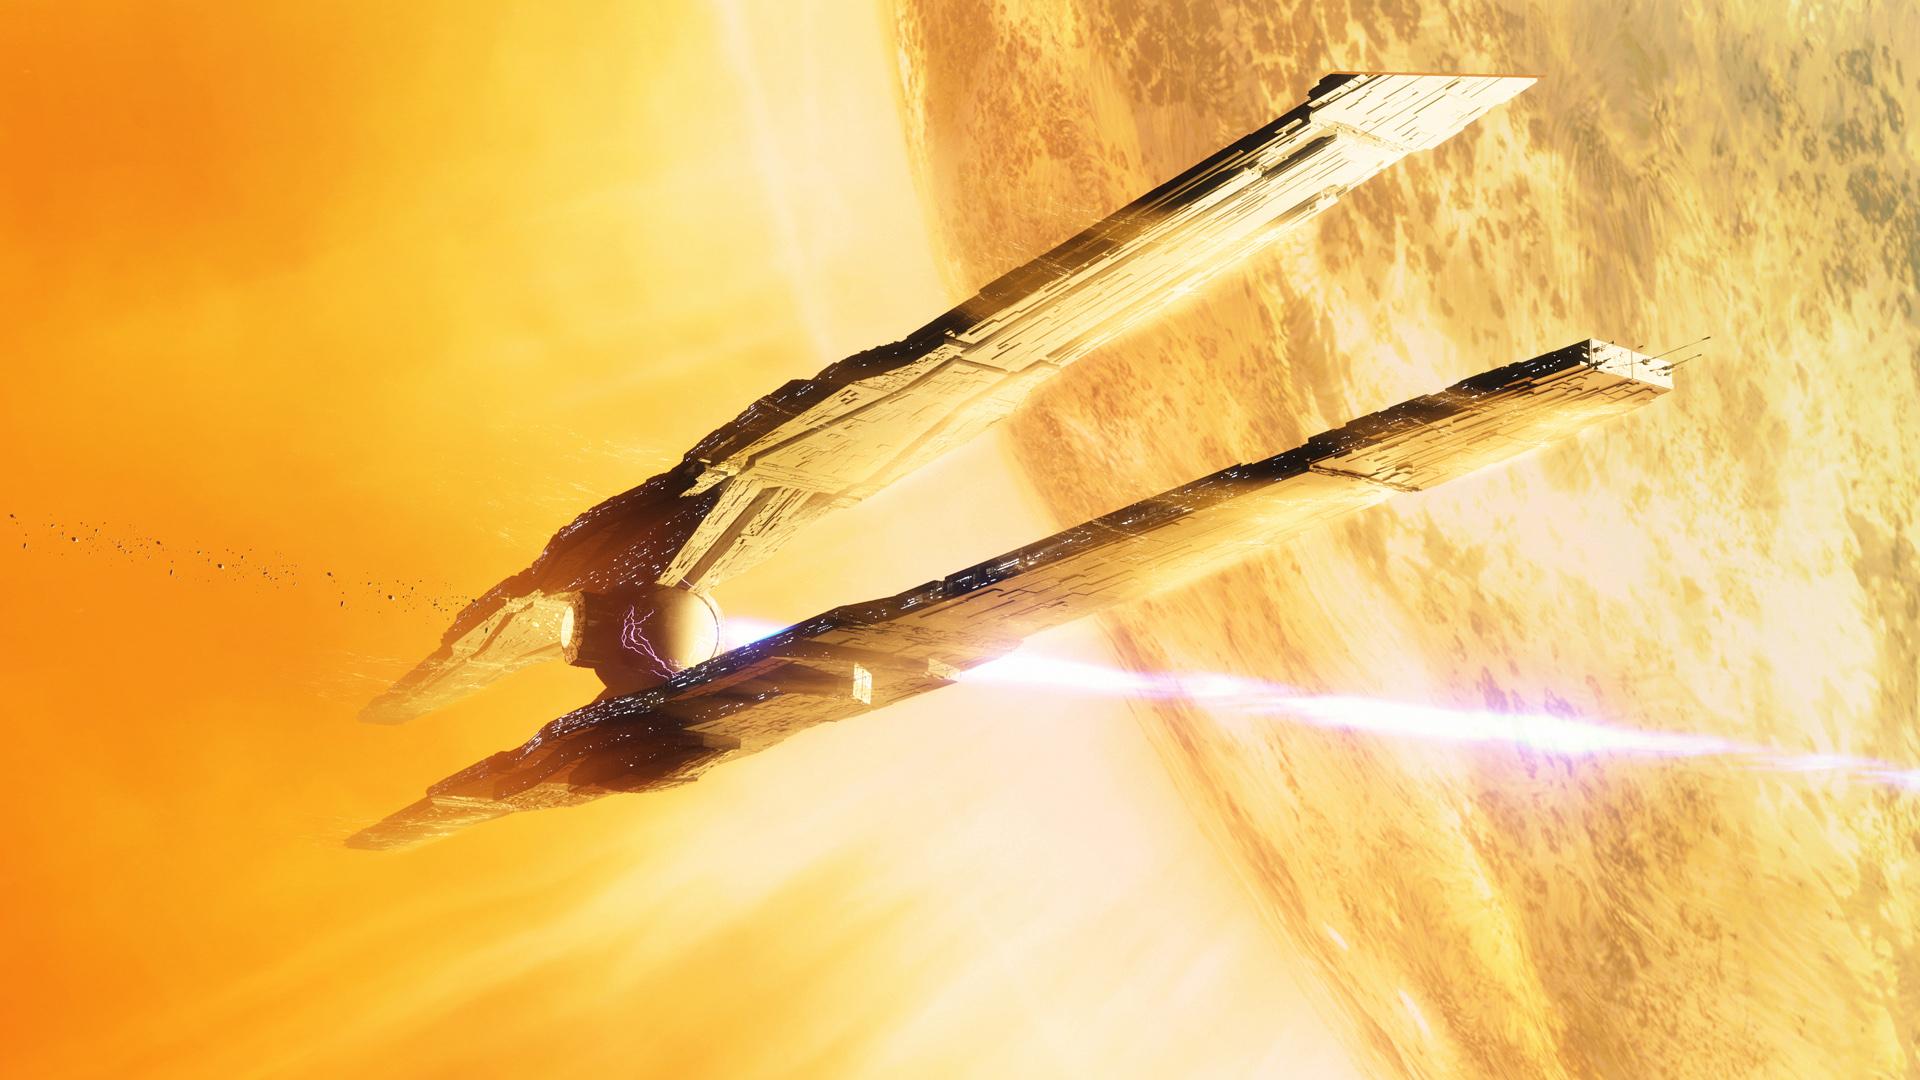 destiny 2 next season announcements